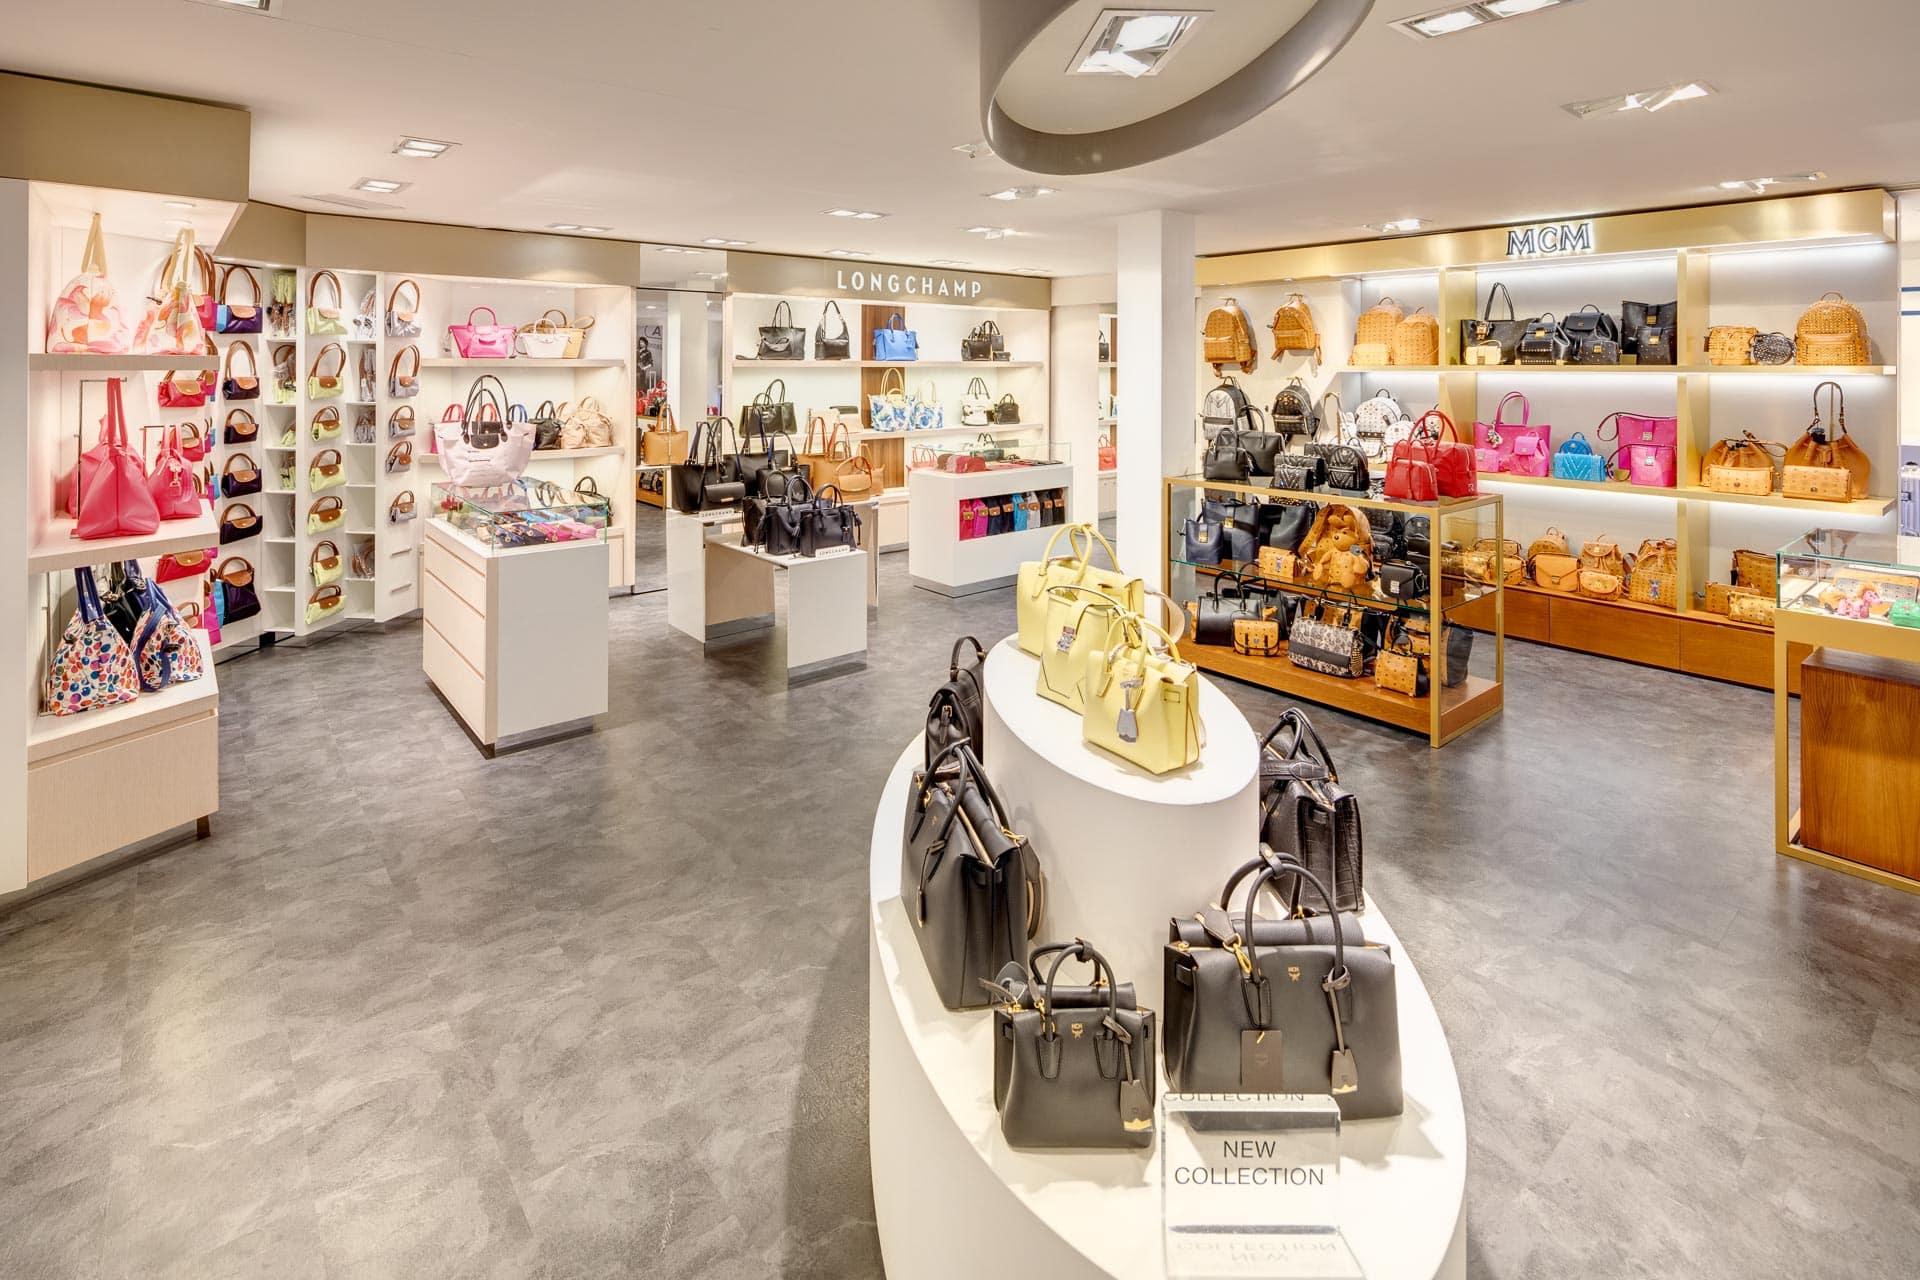 Shopdesign im Schwarzwald Drubba Shopping, Titisee/Neustadt